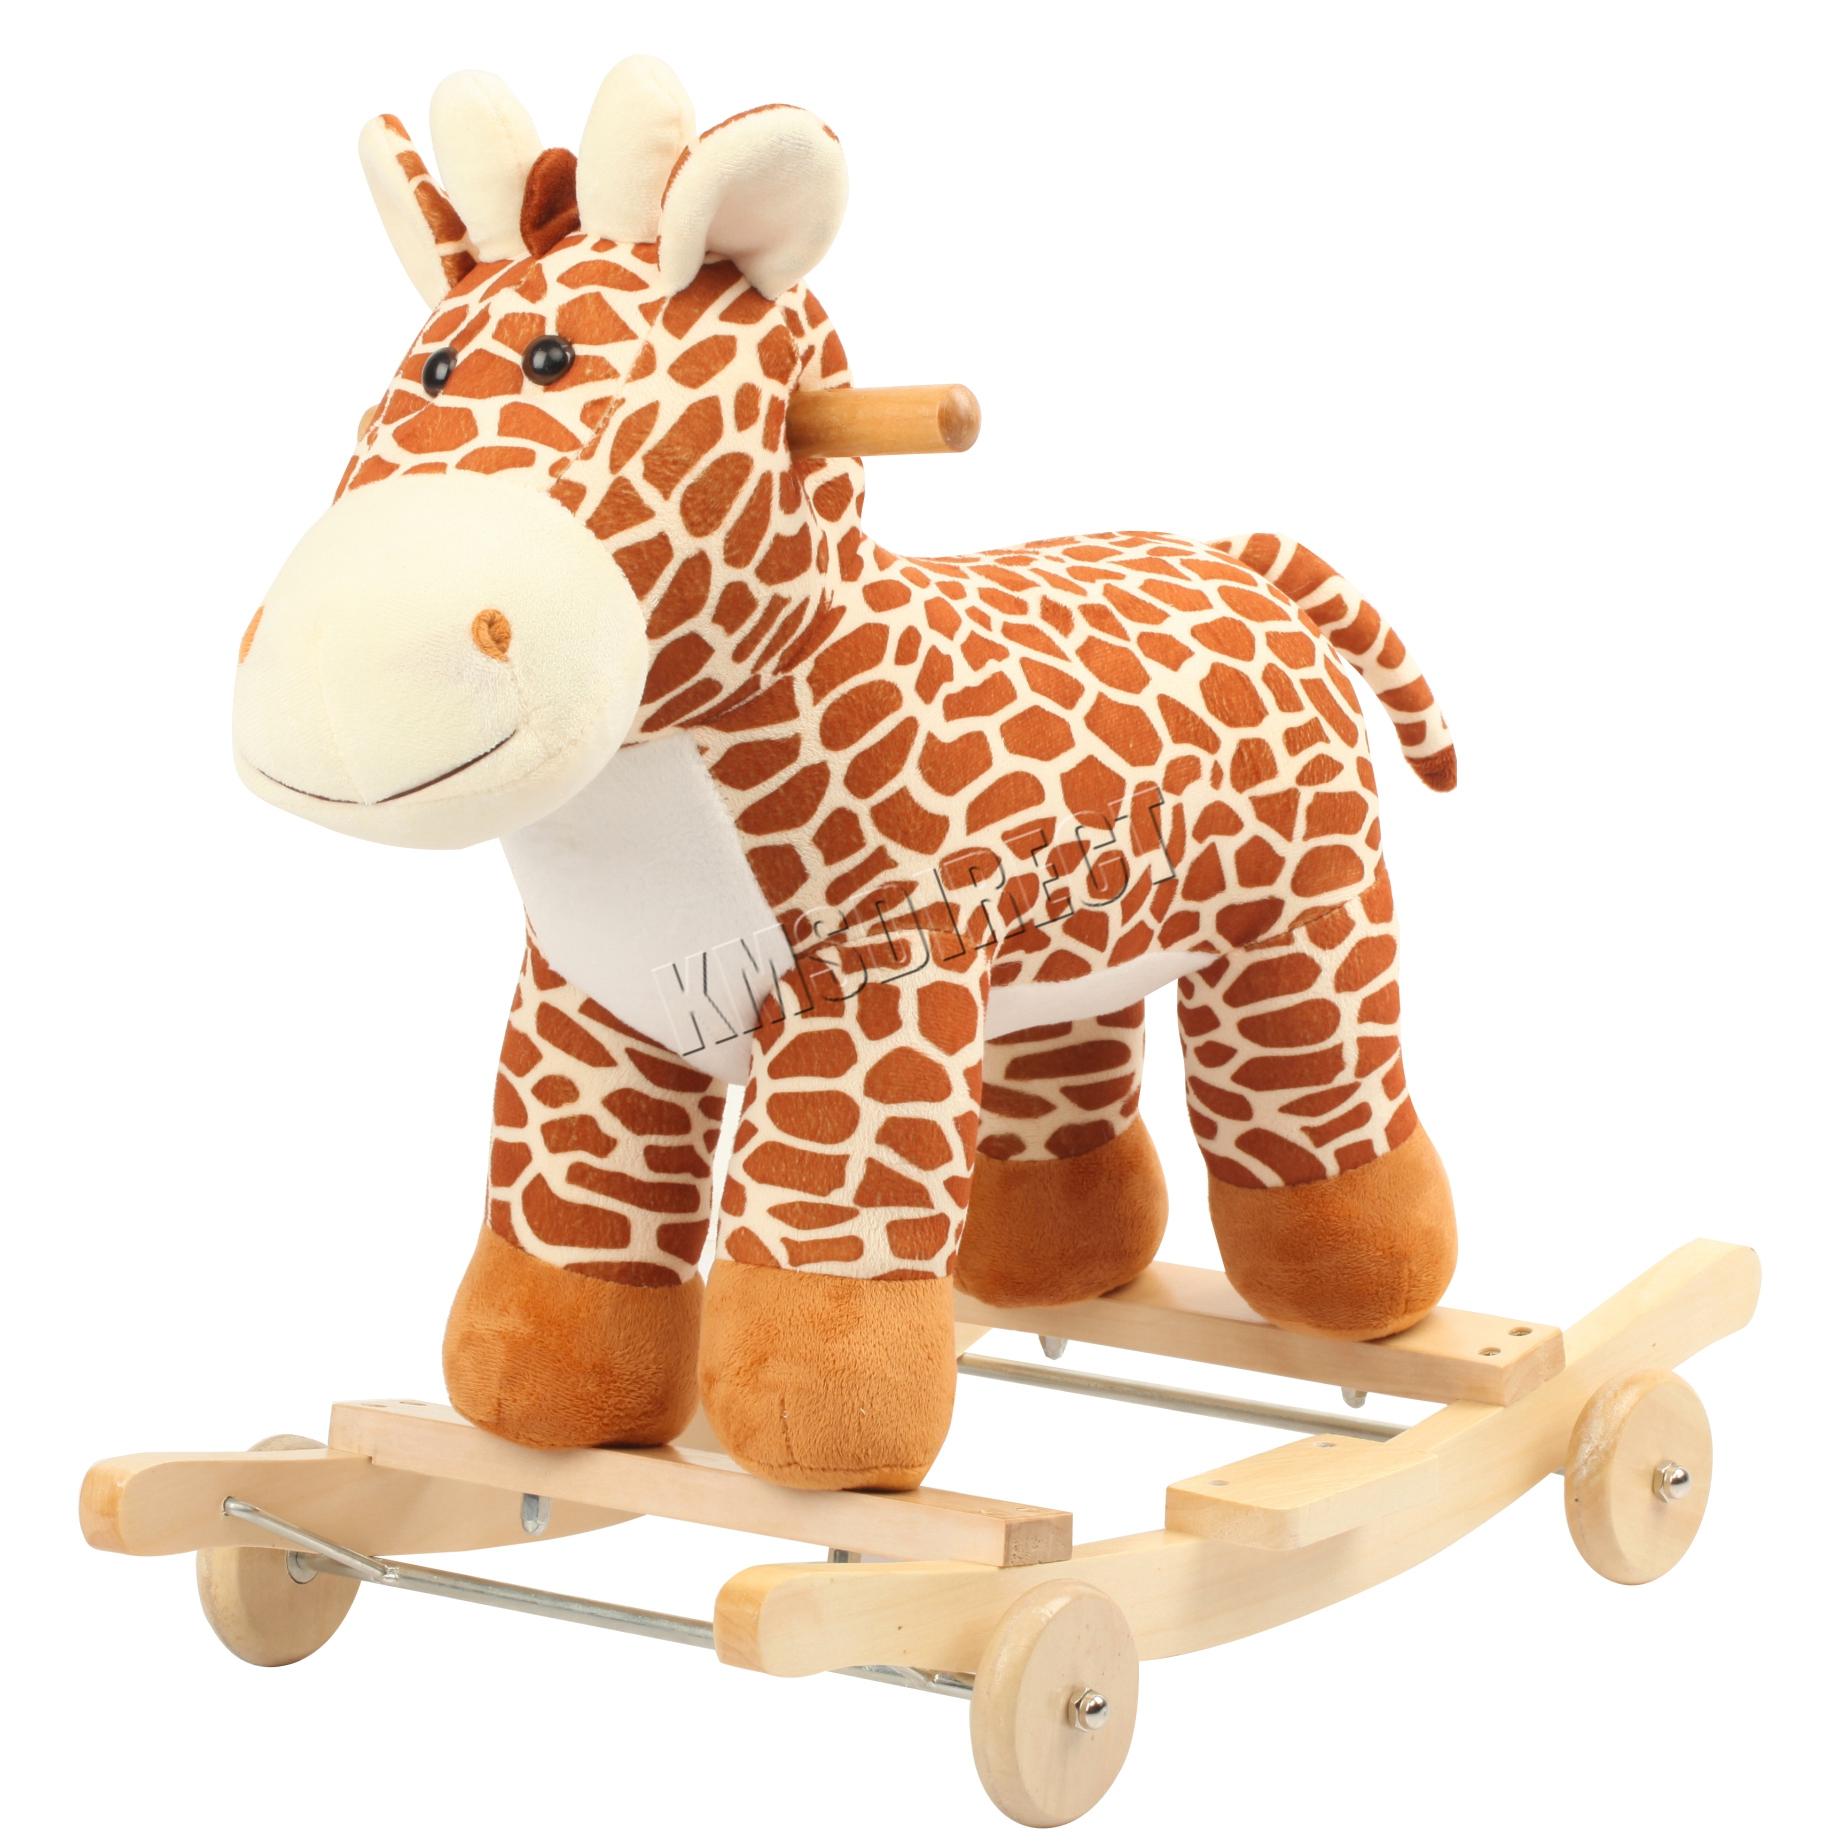 foxhunter animal rocker baby kids rocking infant toddler children toy giraffe ebay. Black Bedroom Furniture Sets. Home Design Ideas